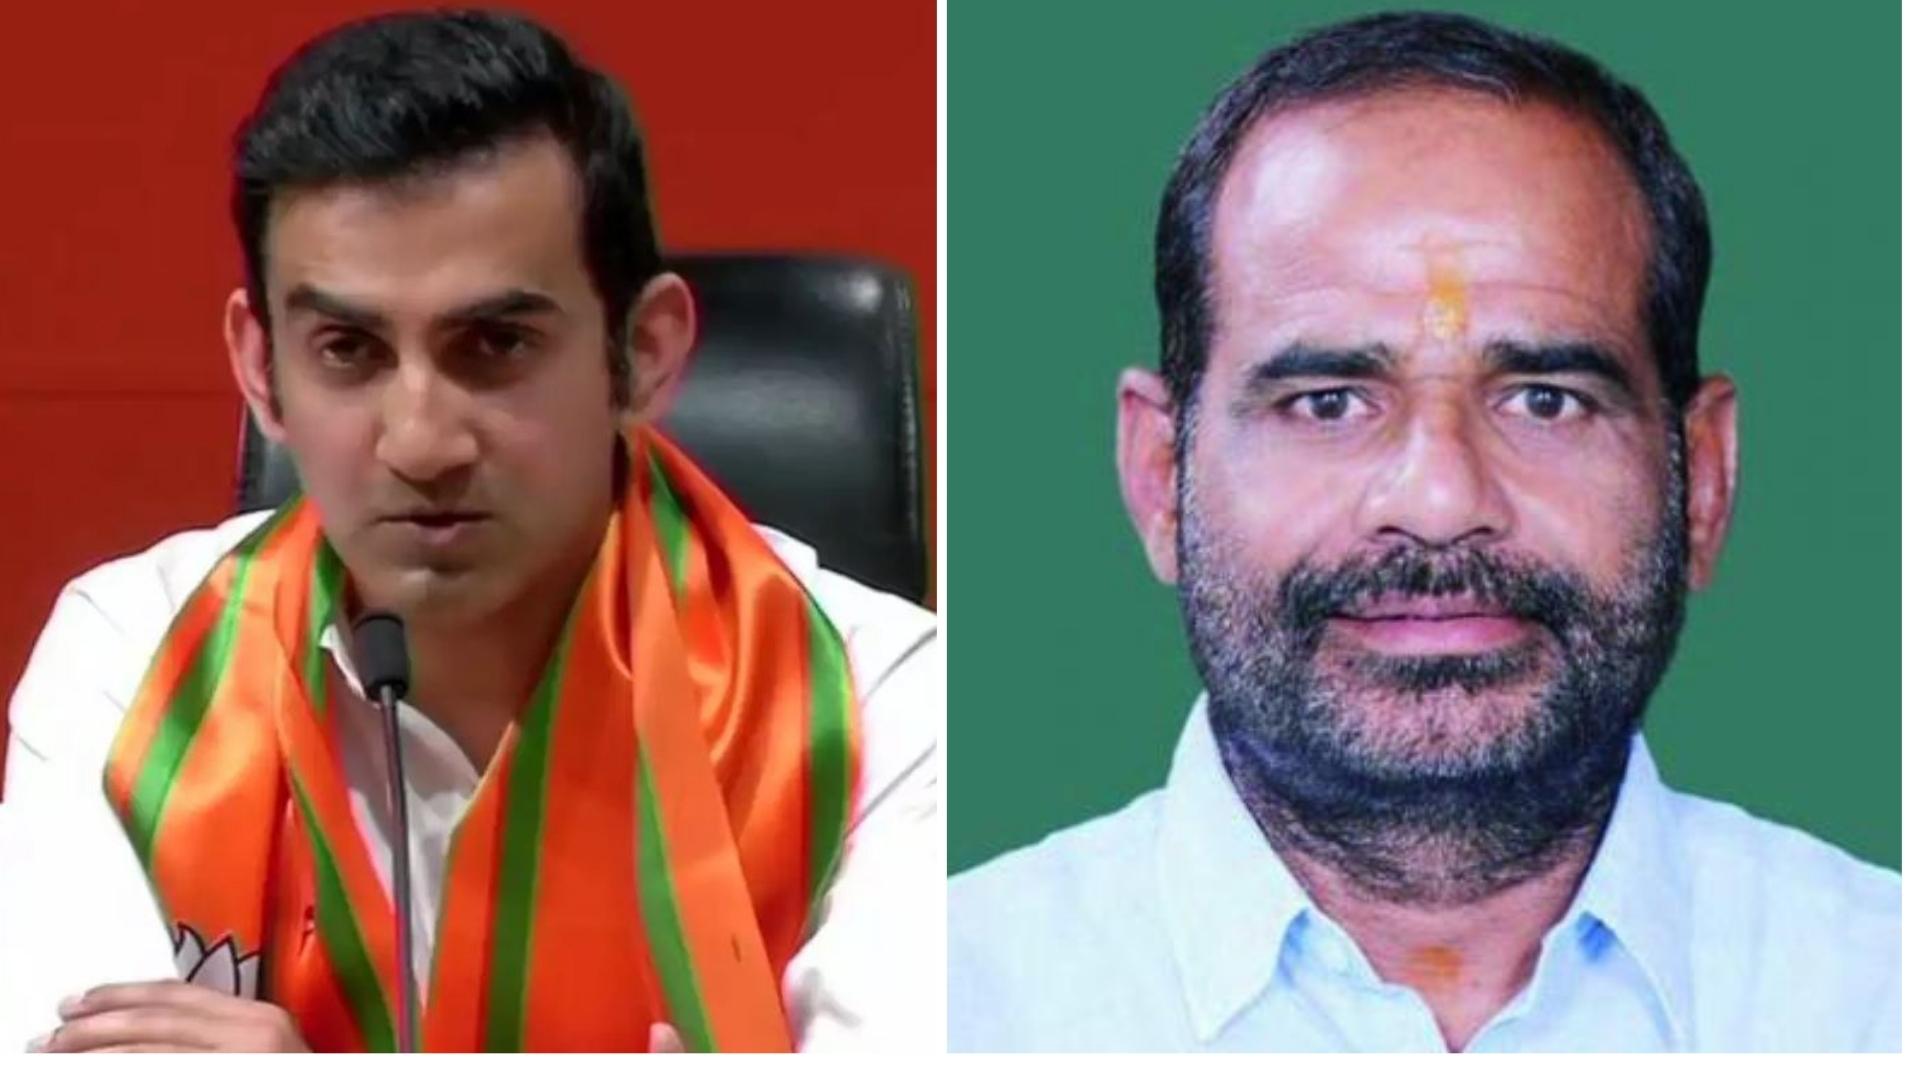 AAP Raises 'Objections' on 2 BJP Nominations in Delhi